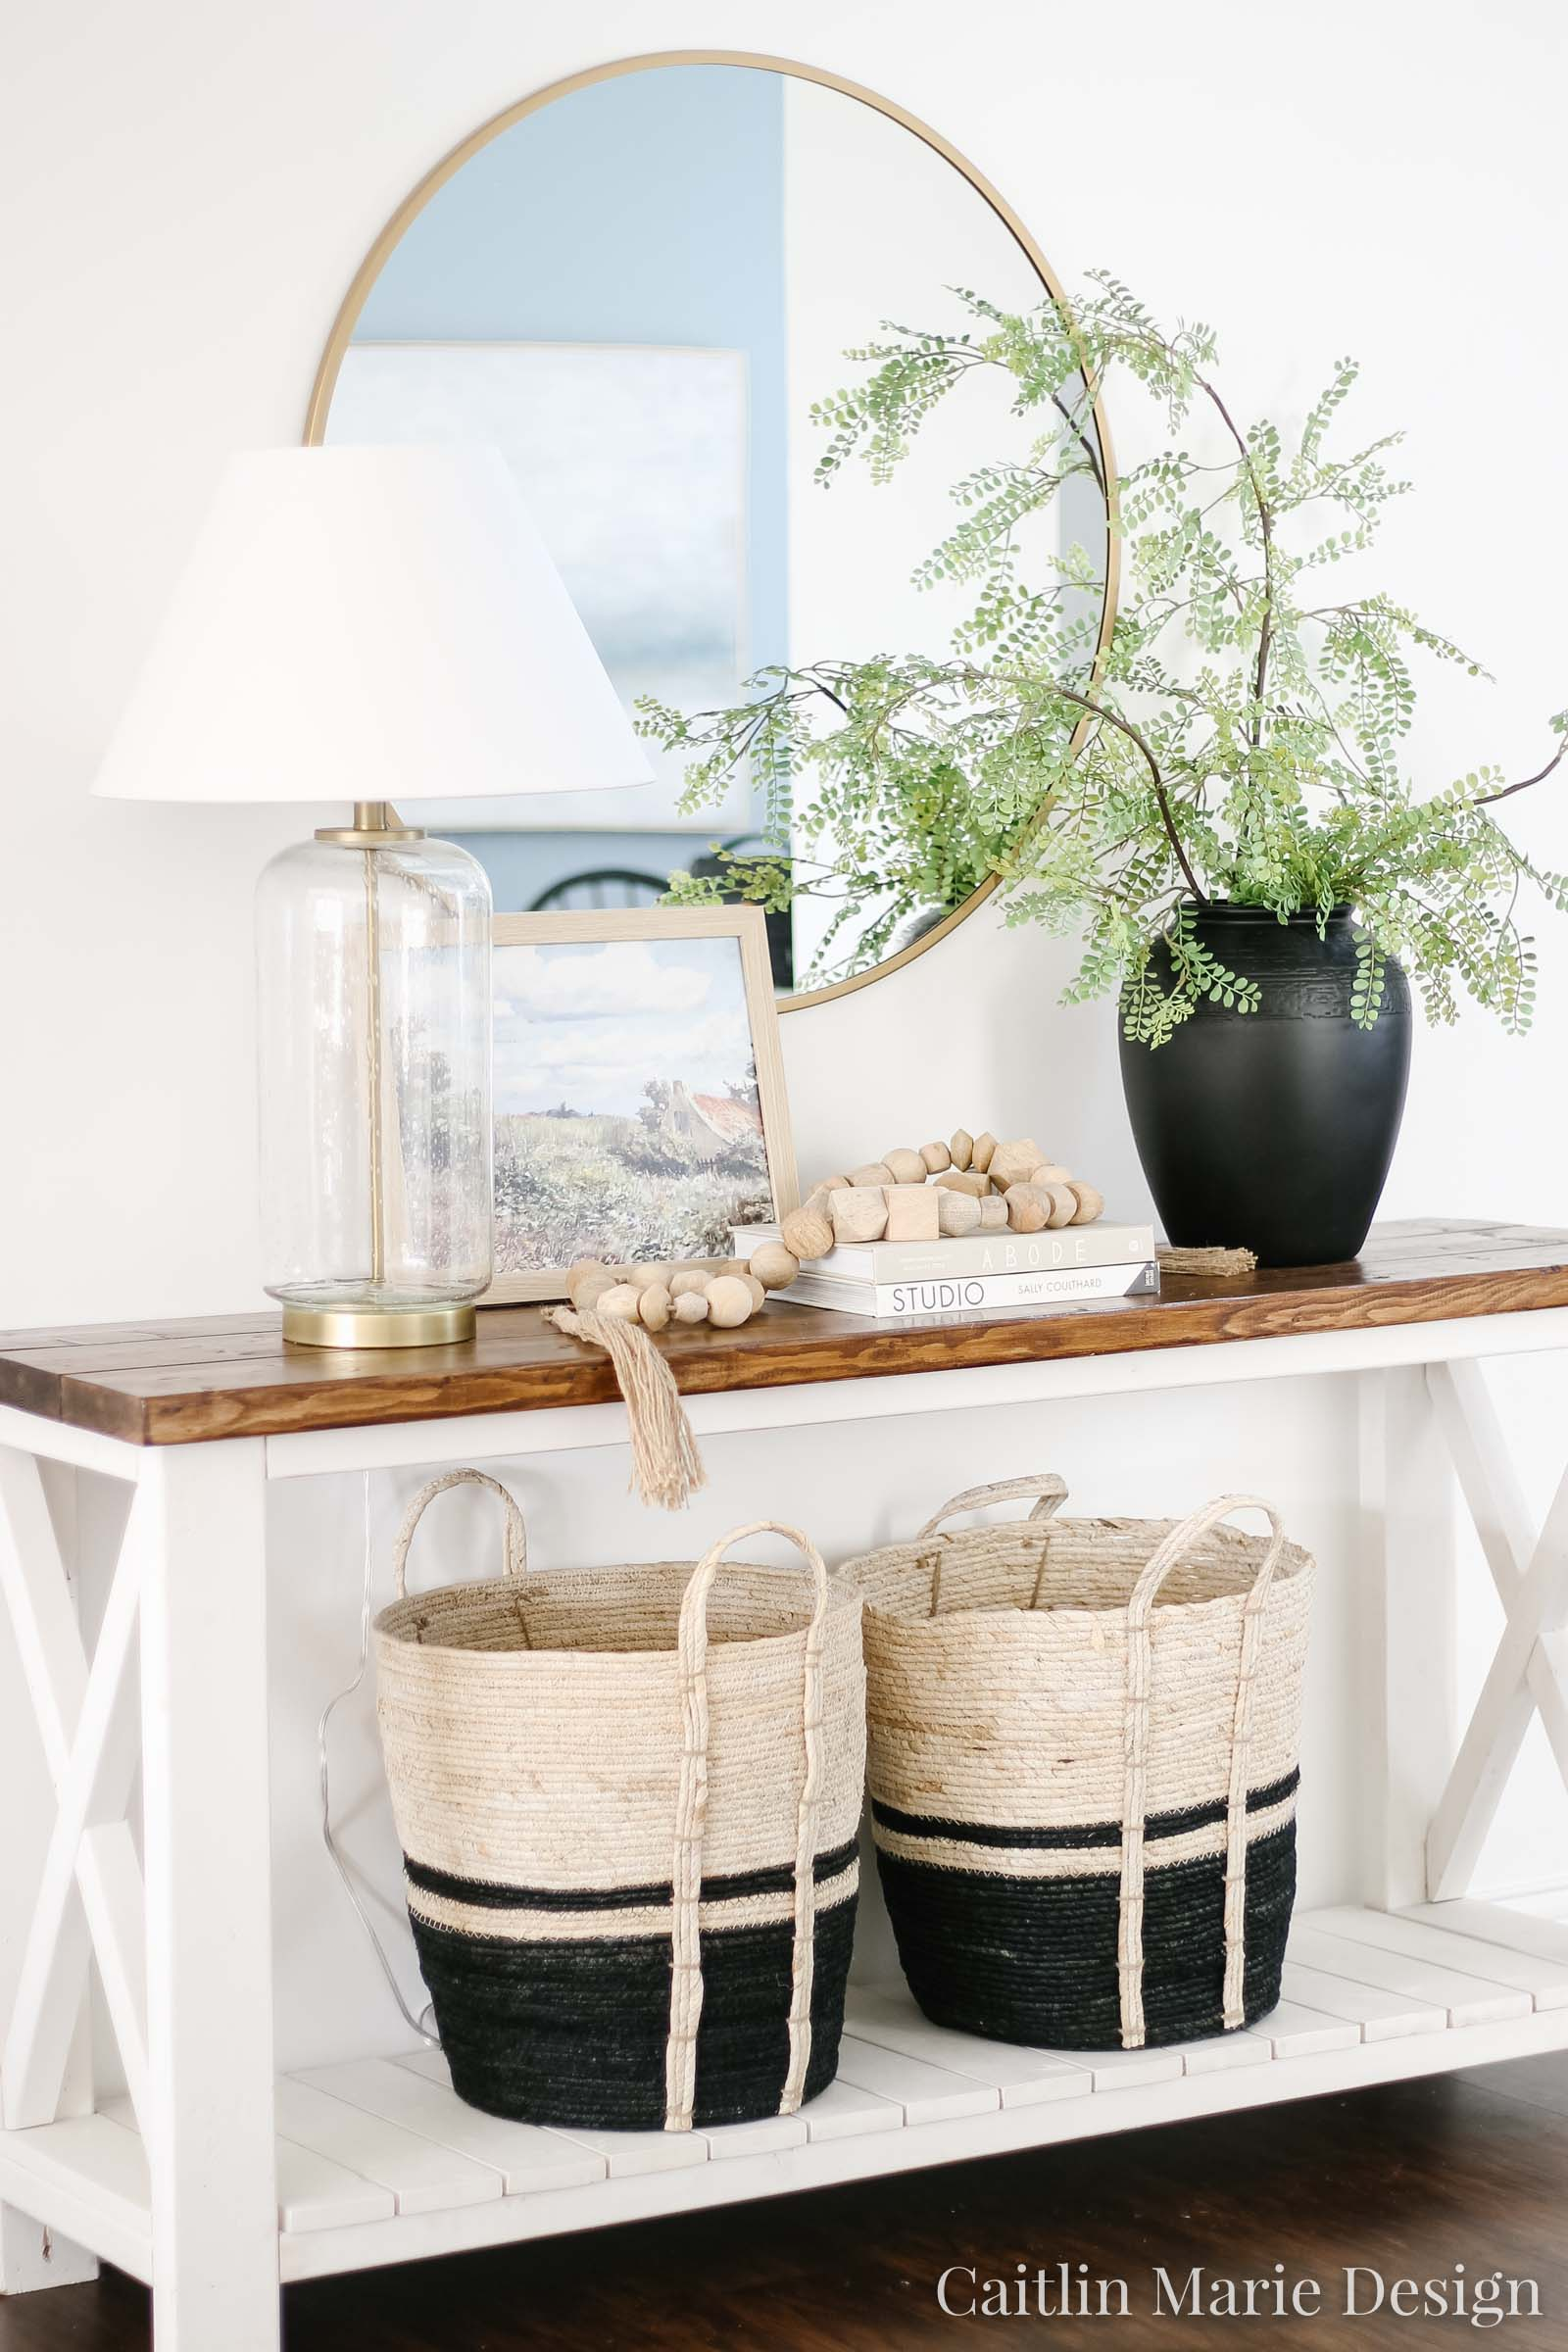 Coastal Traditional Entryway Decor | spring home tour, modern traditional decor, entryway design, wood bead garland, airy home decor